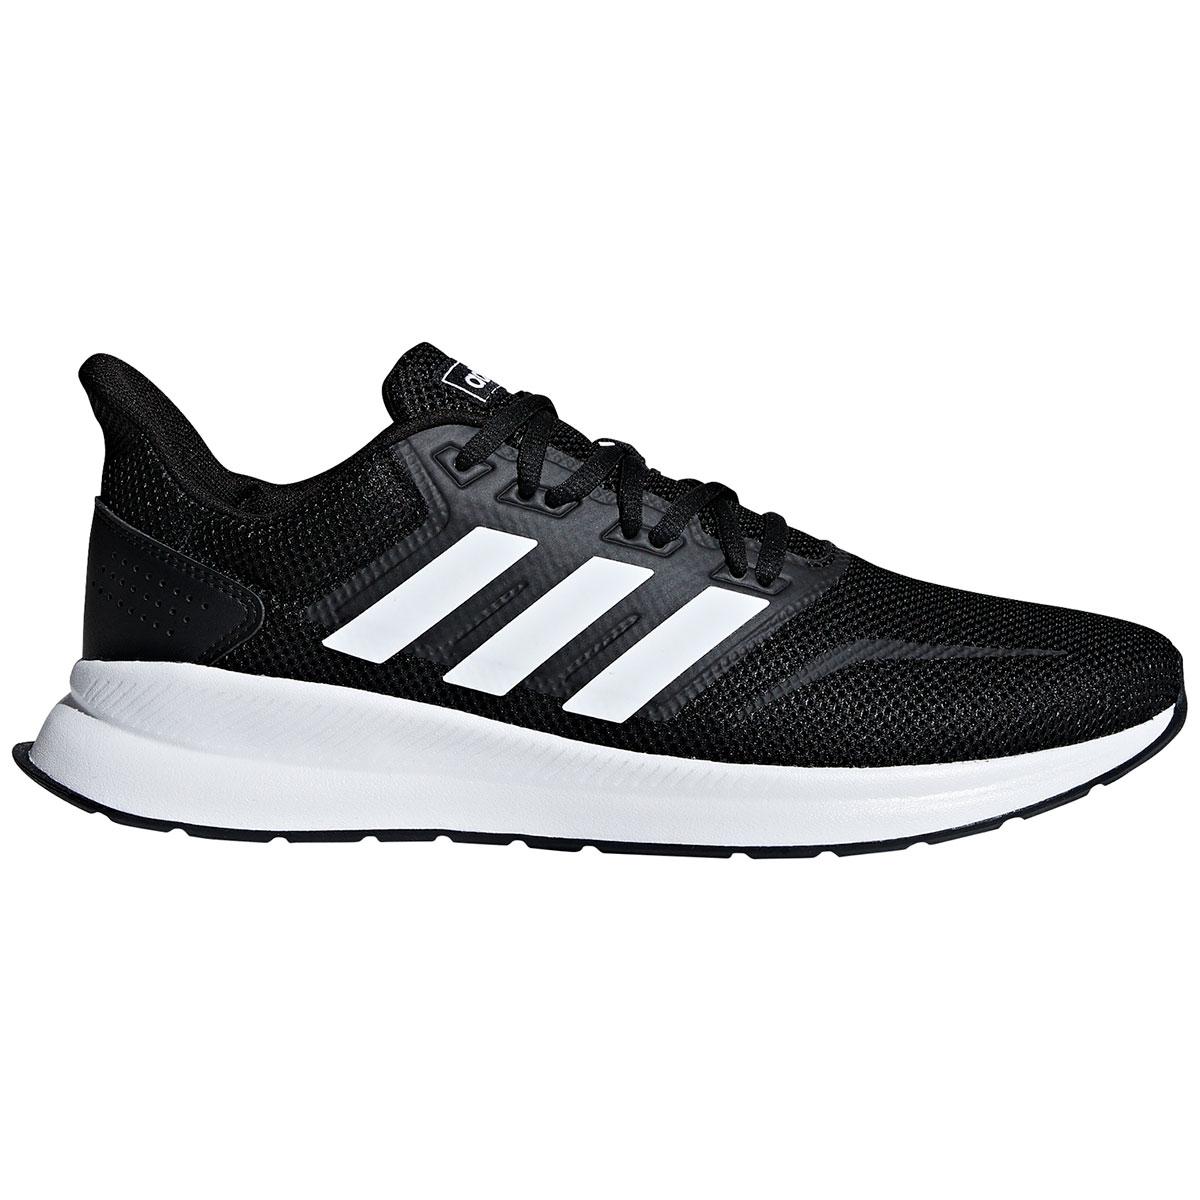 Adidas Men's Run Falcon Running Shoes - Black, 9.5